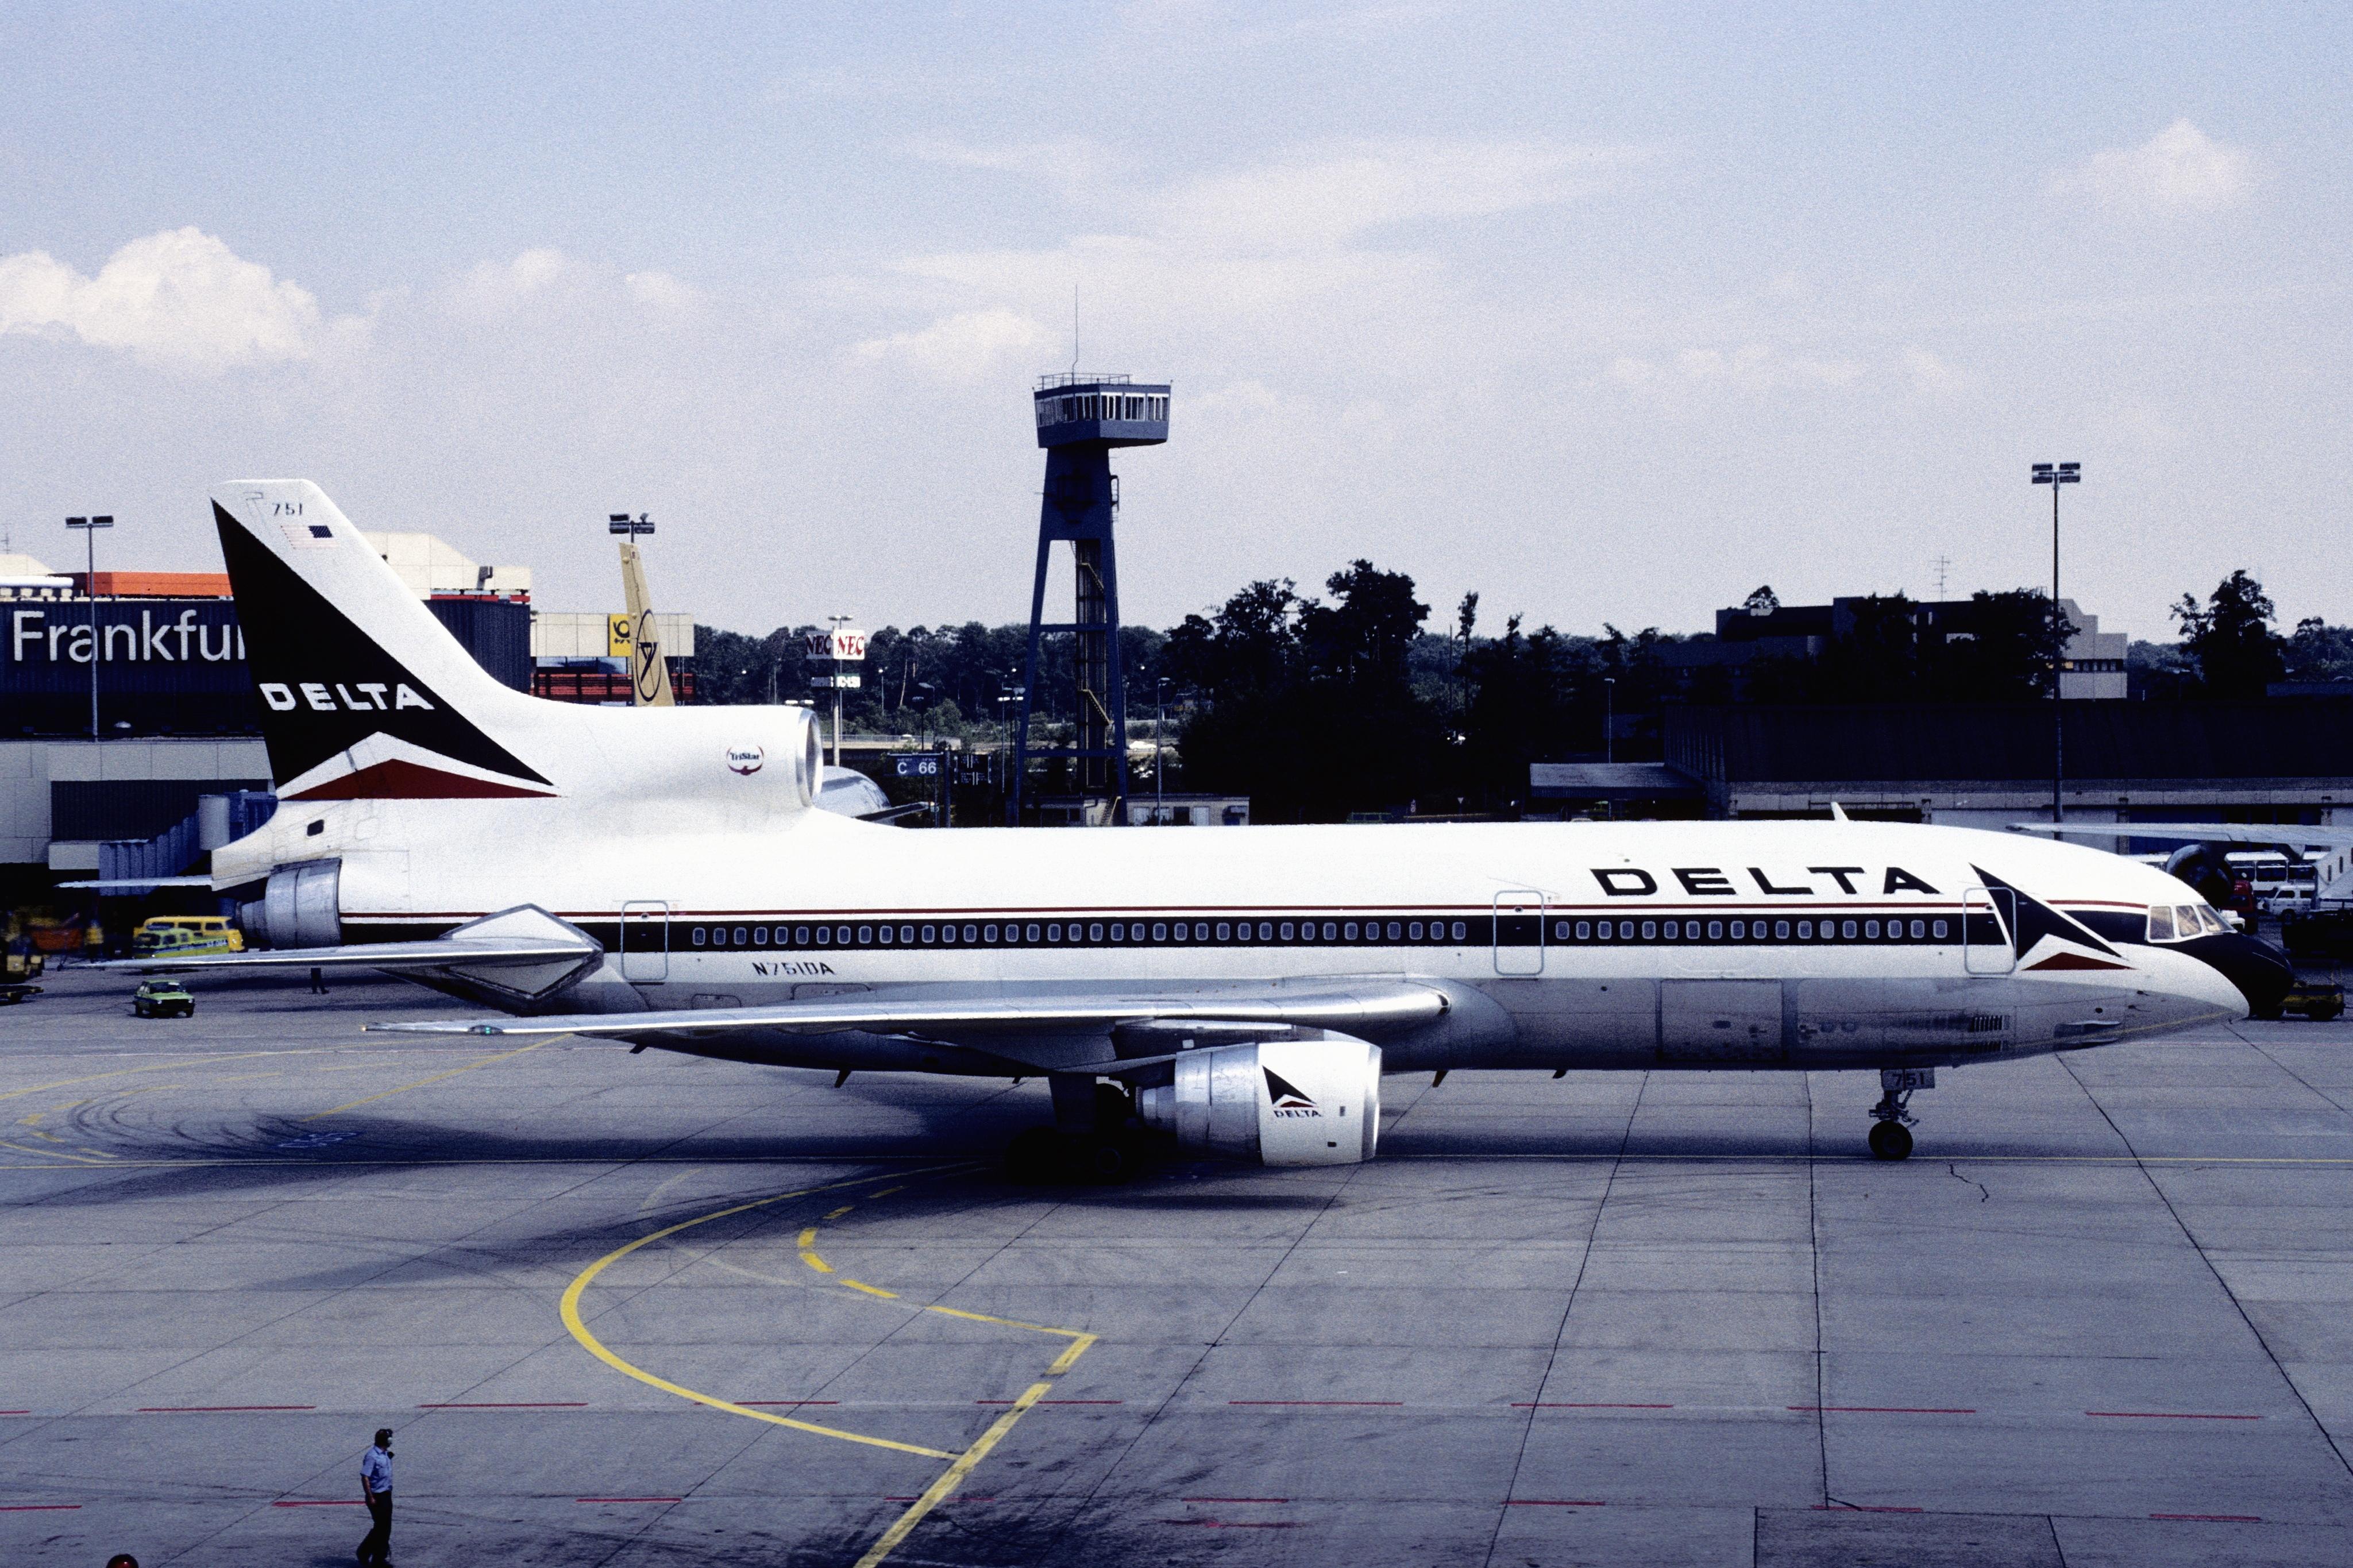 File:Delta Air Lines Lockheed L-1011 TriStar 500 (N751DA 1166) (